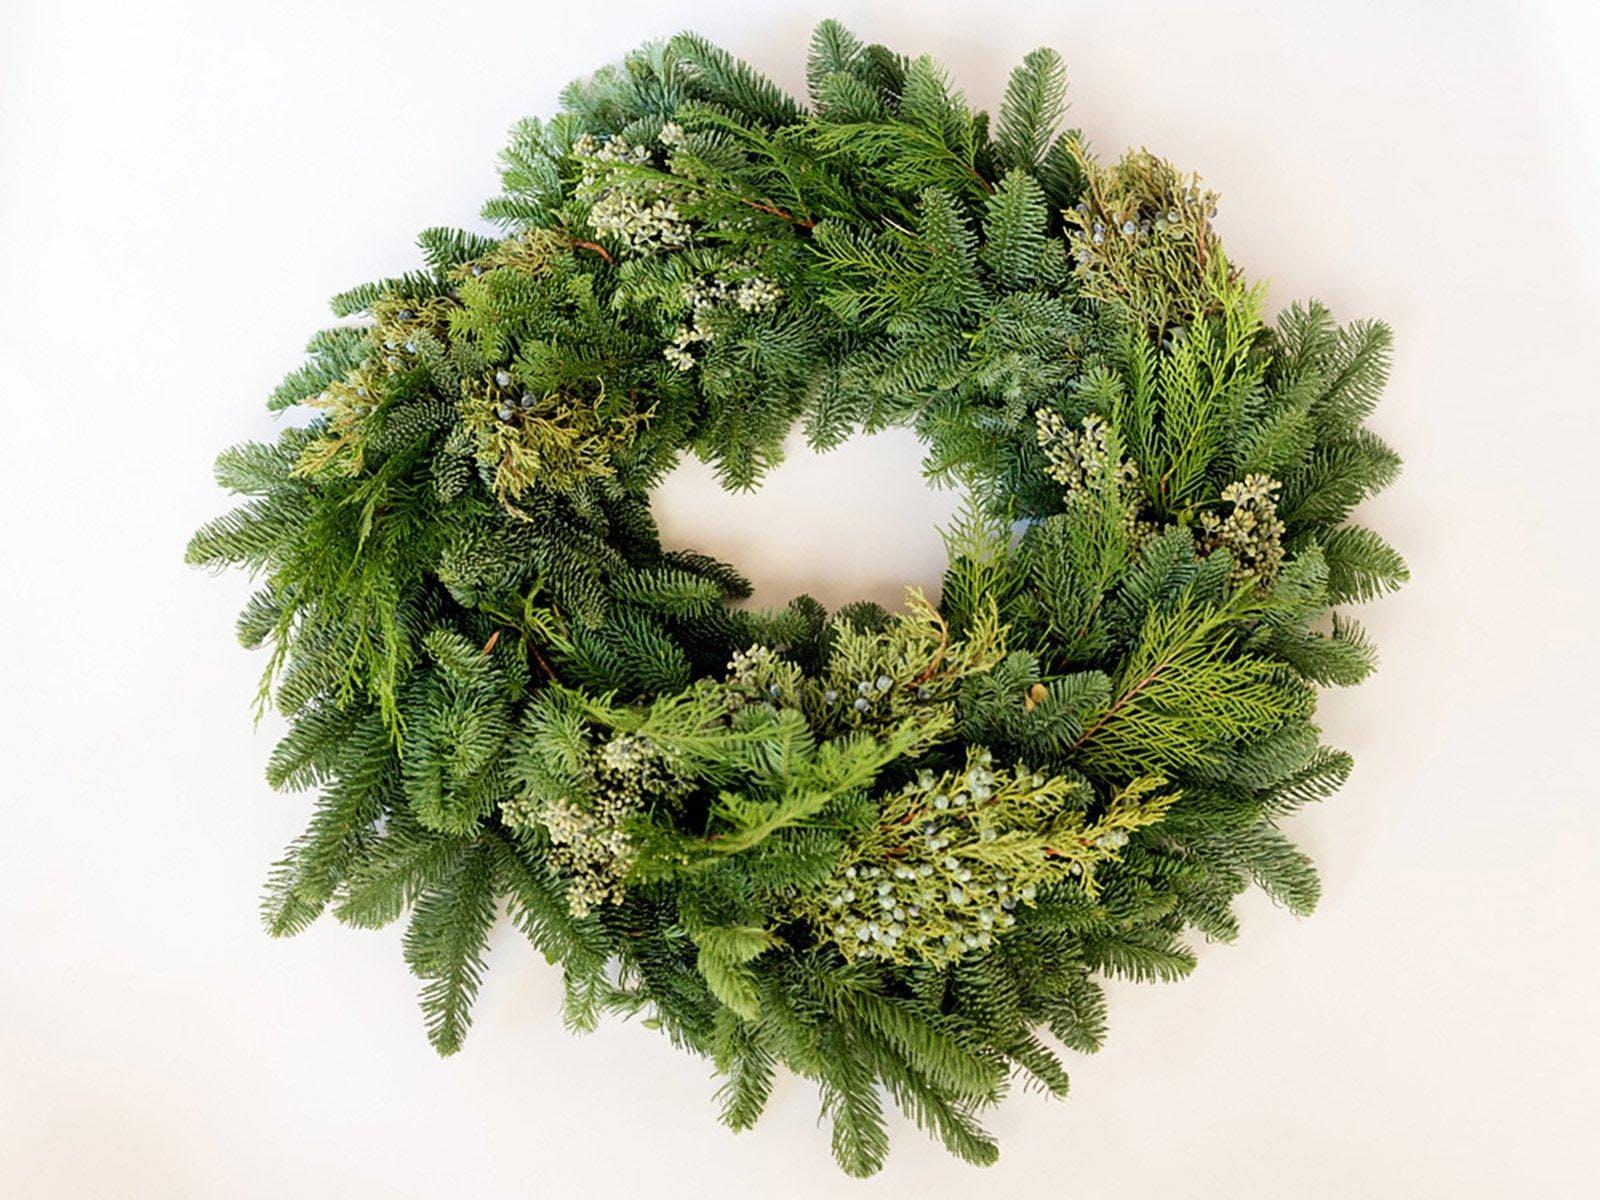 Gettysburg Garden Club Christmas Greens & Gourmet Gifts Sale at ...